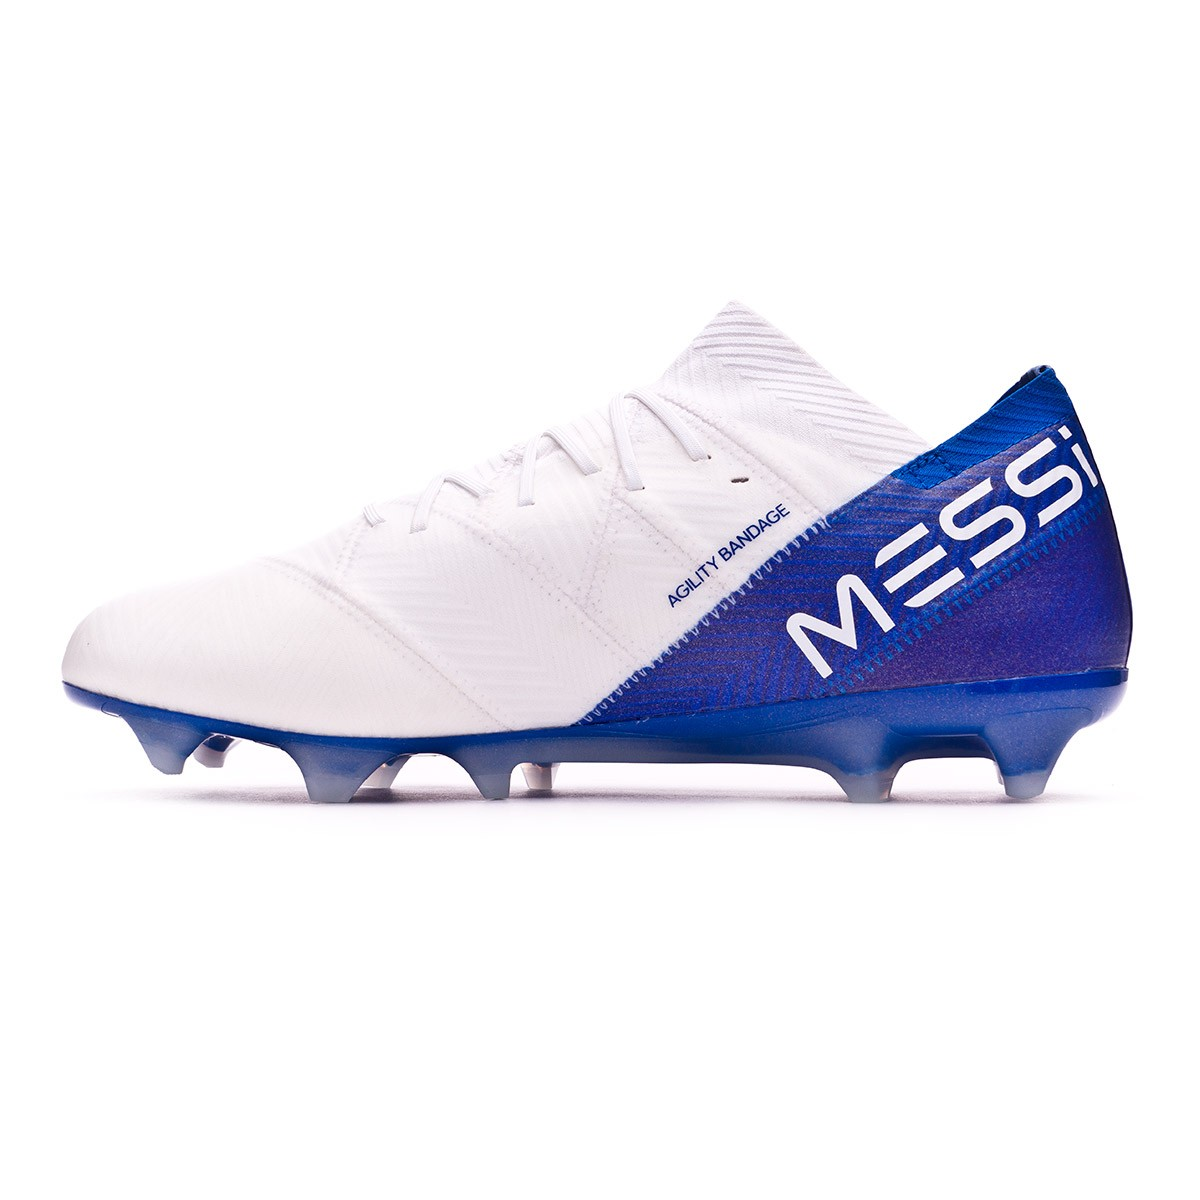 41ce1ac1d2b5 Football Boots adidas Nemeziz Messi 18.1 FG White-Core black-Football blue  - Football store Fútbol Emotion